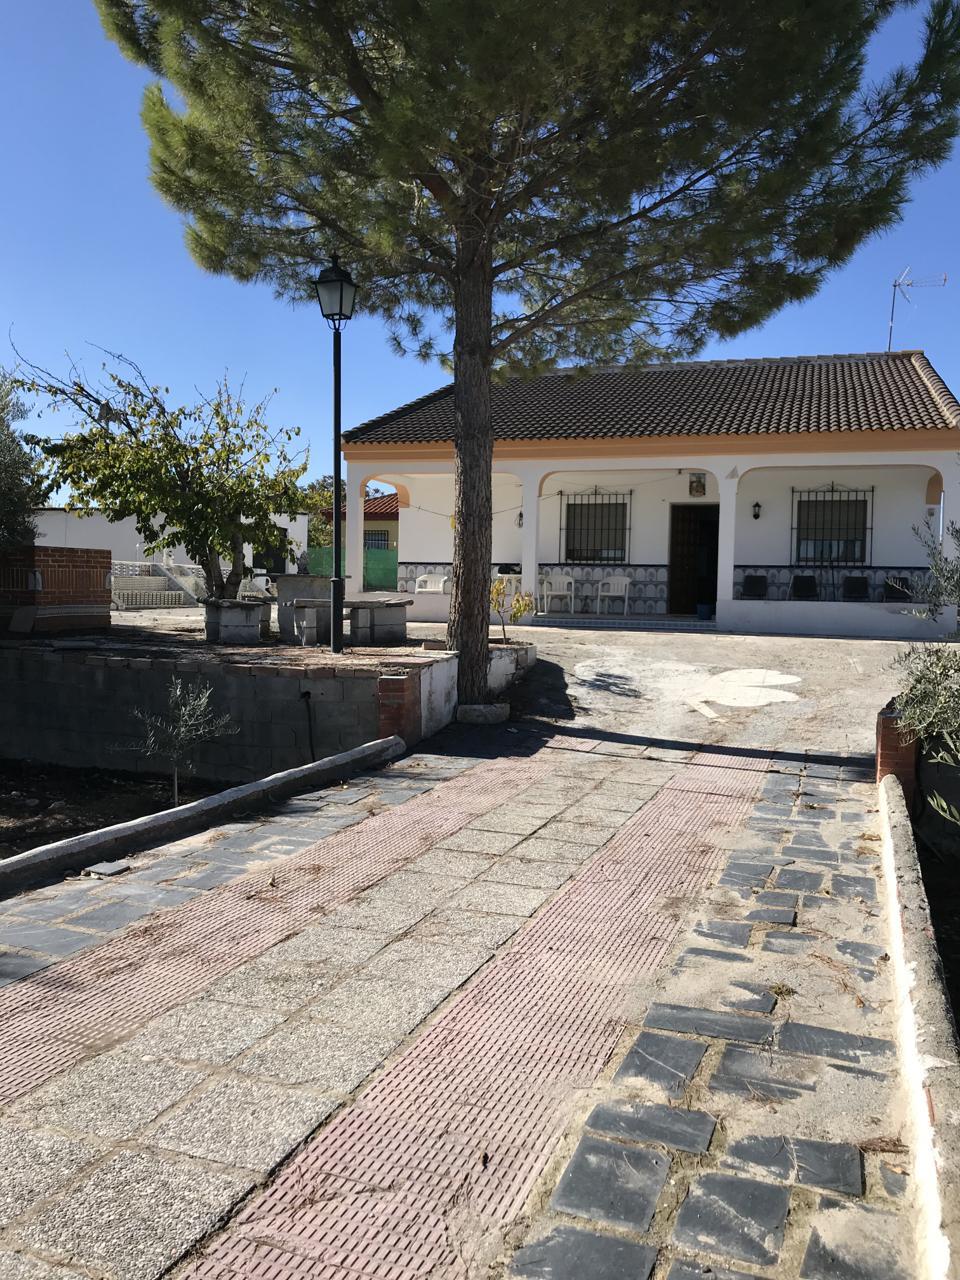 Moraleda de Zafayona Spain